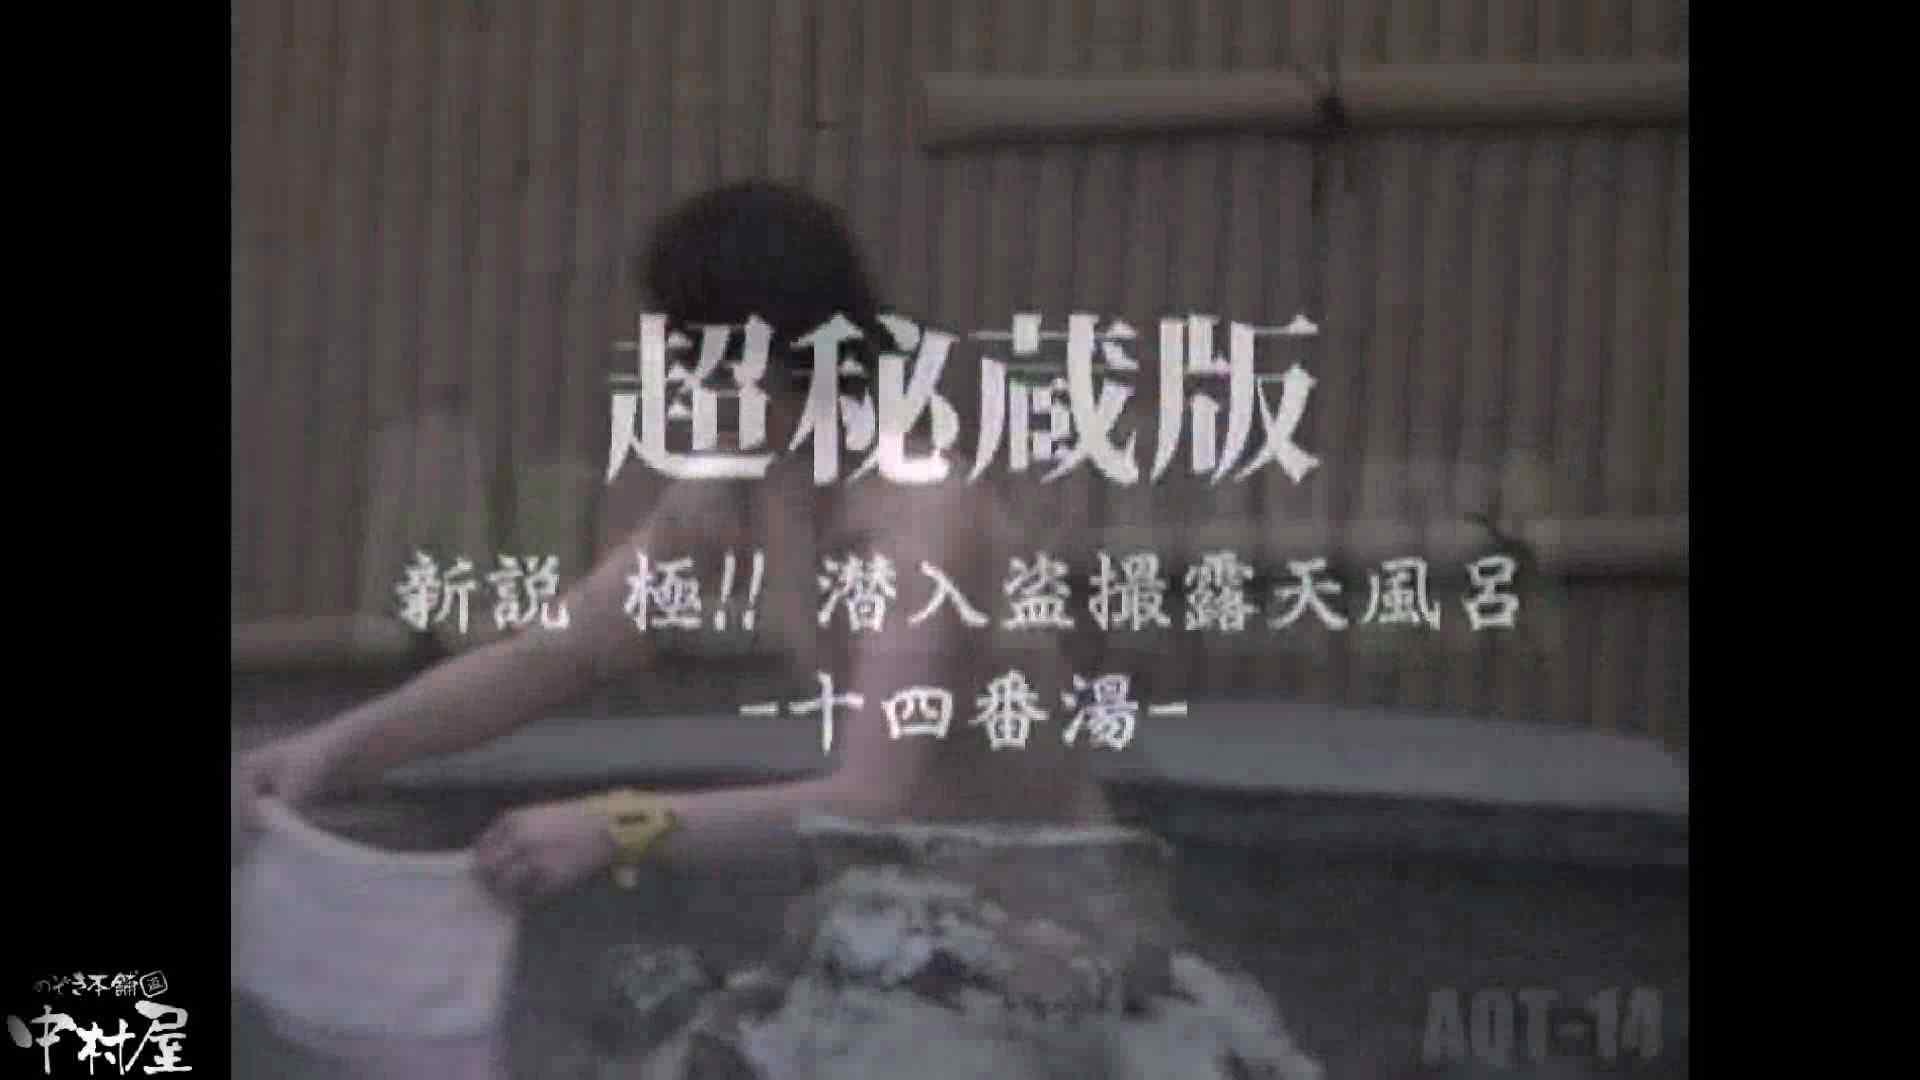 Aquaな露天風呂Vol.878潜入盗撮露天風呂十四判湯 其の三 潜入 | OLセックス  110画像 5